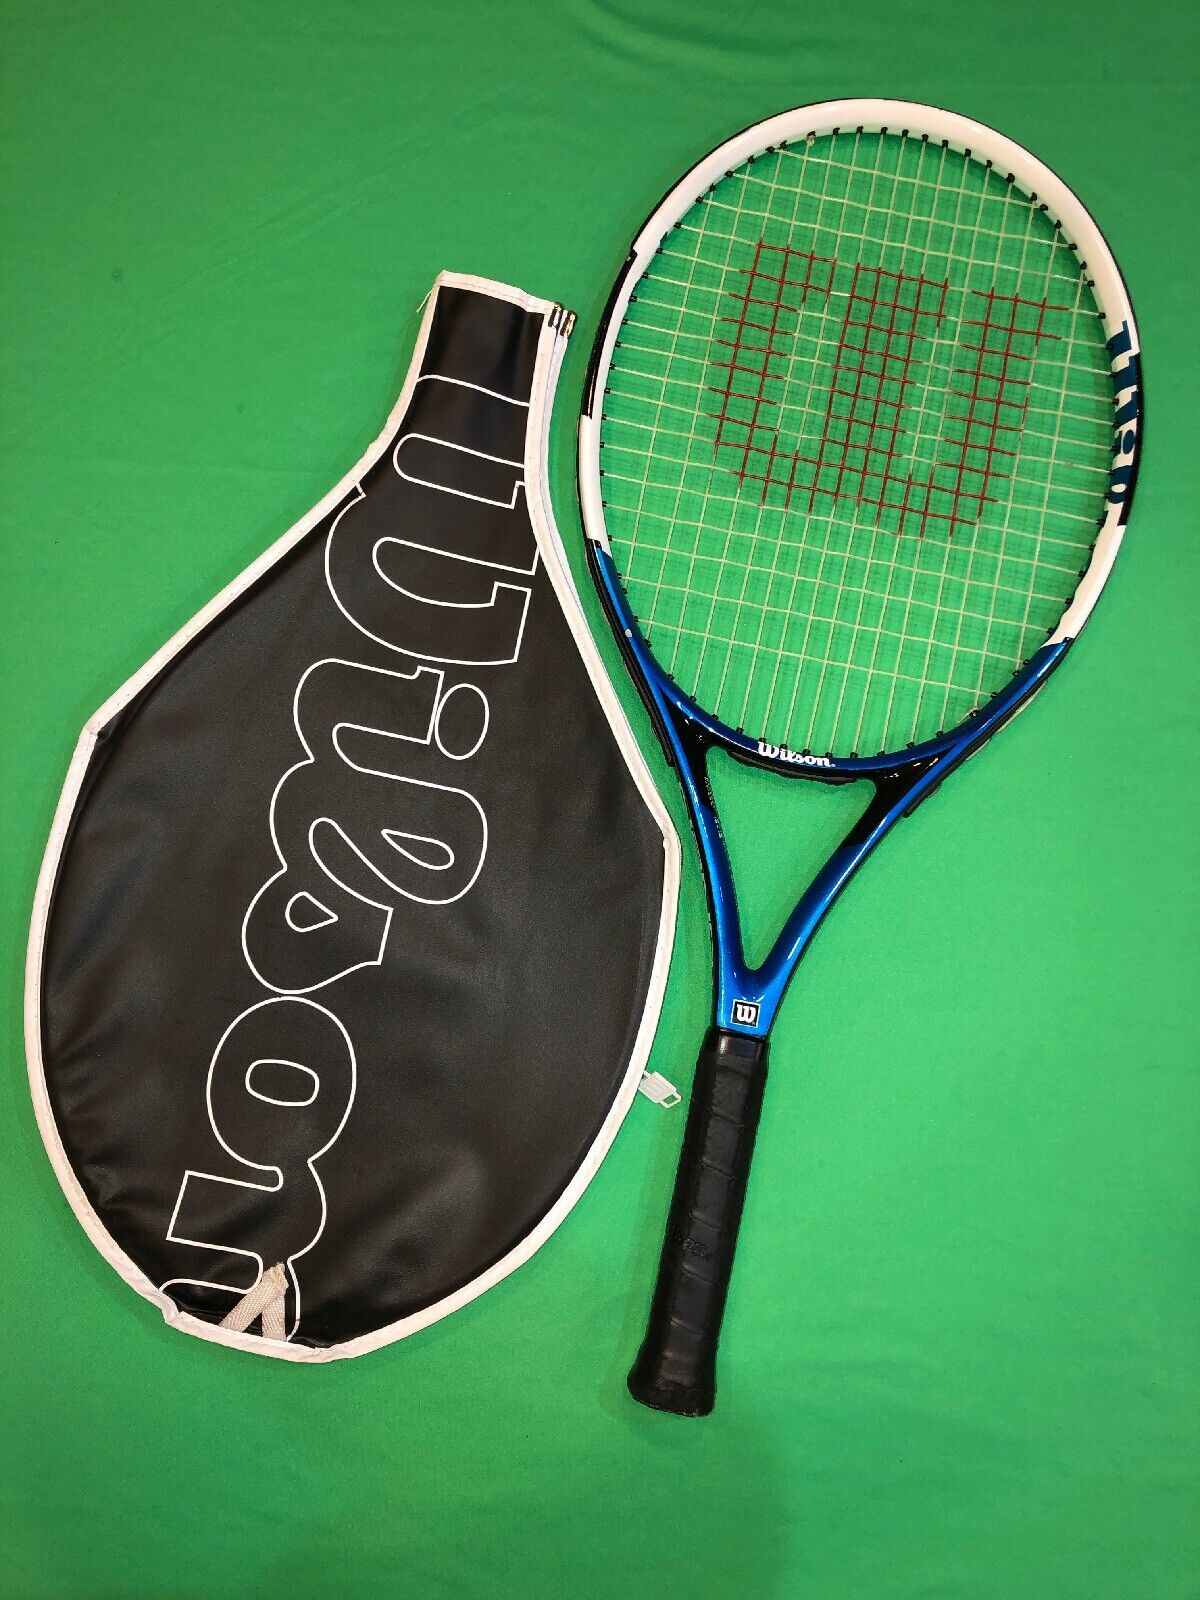 Wilson Nano Carbon 25 Tennis Racquet 3 7 8  L00 8.8oz. Junior w Cover